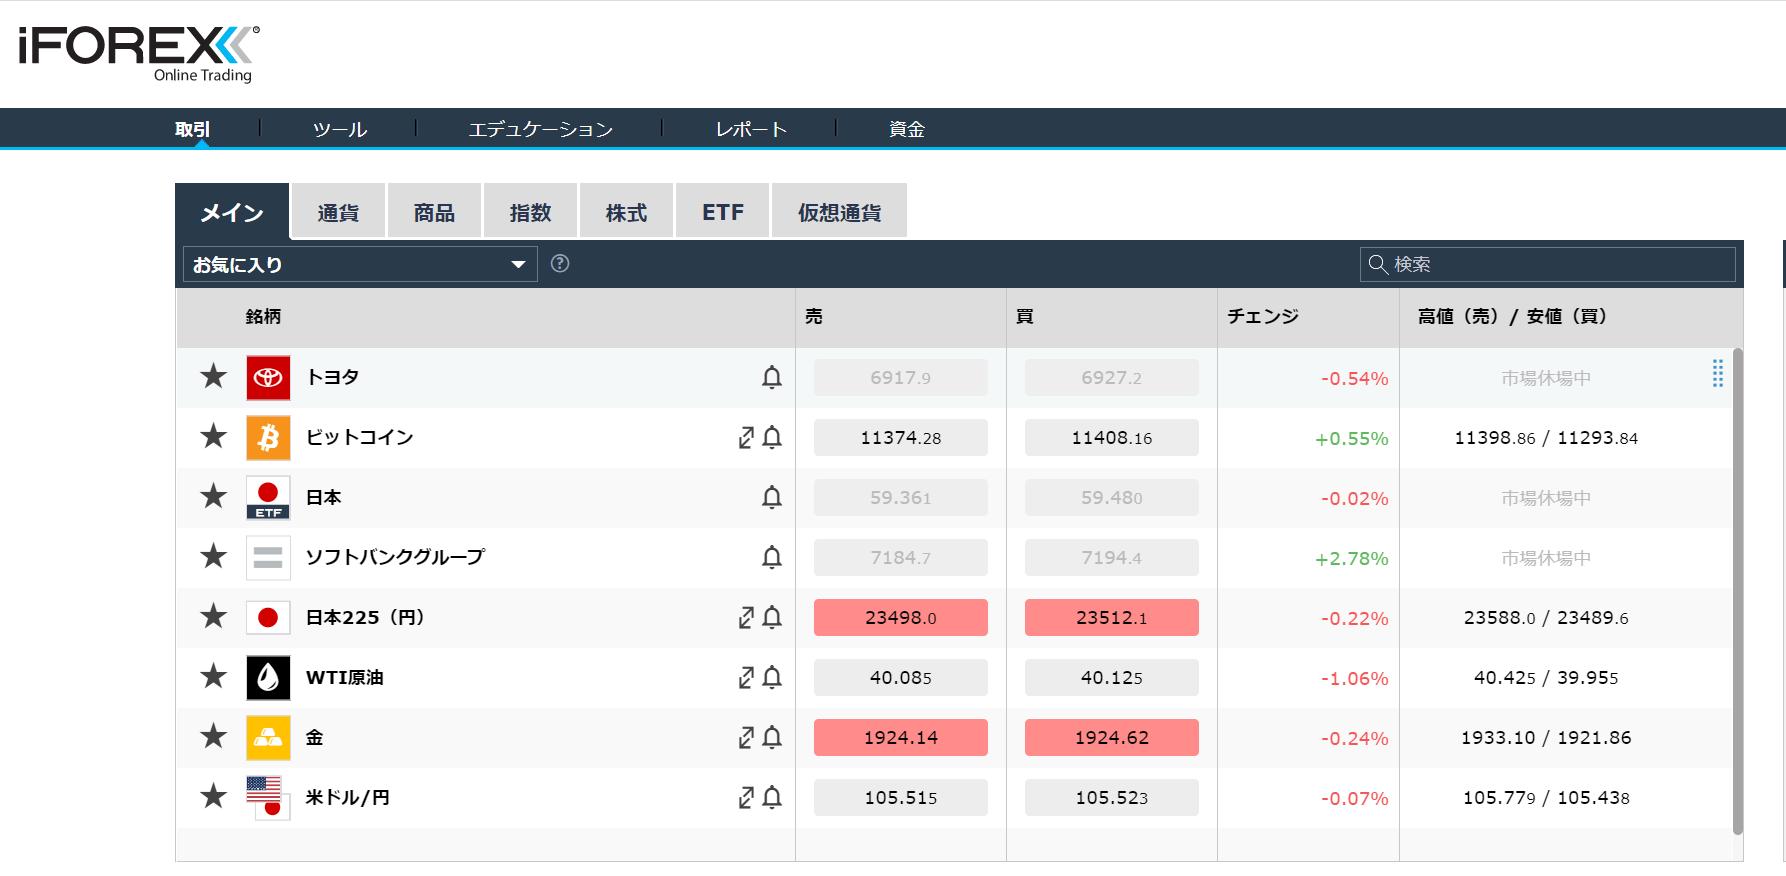 iForexの取引プラットフォーム